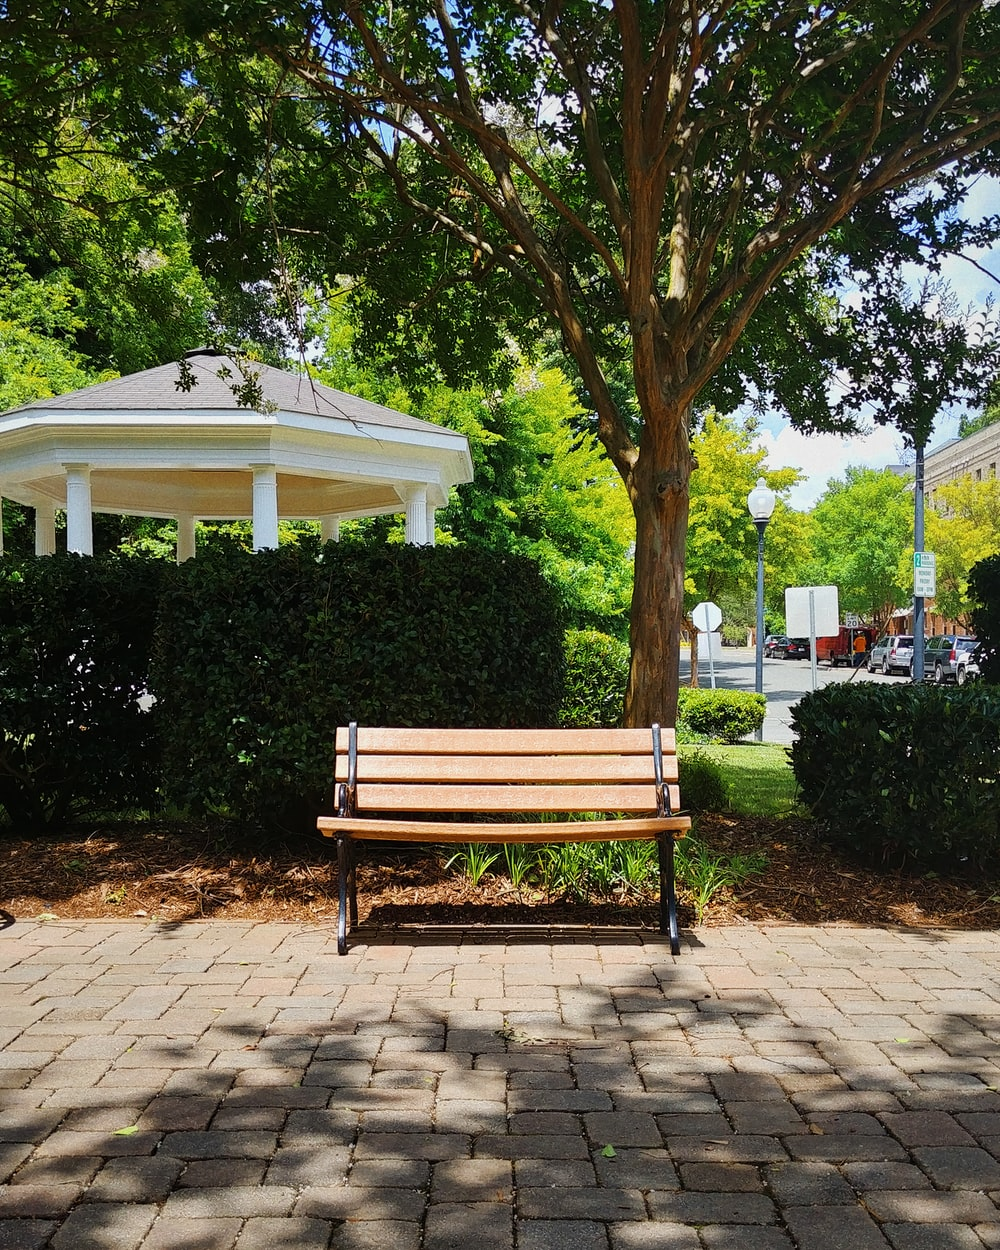 brown wooden bench under green tree